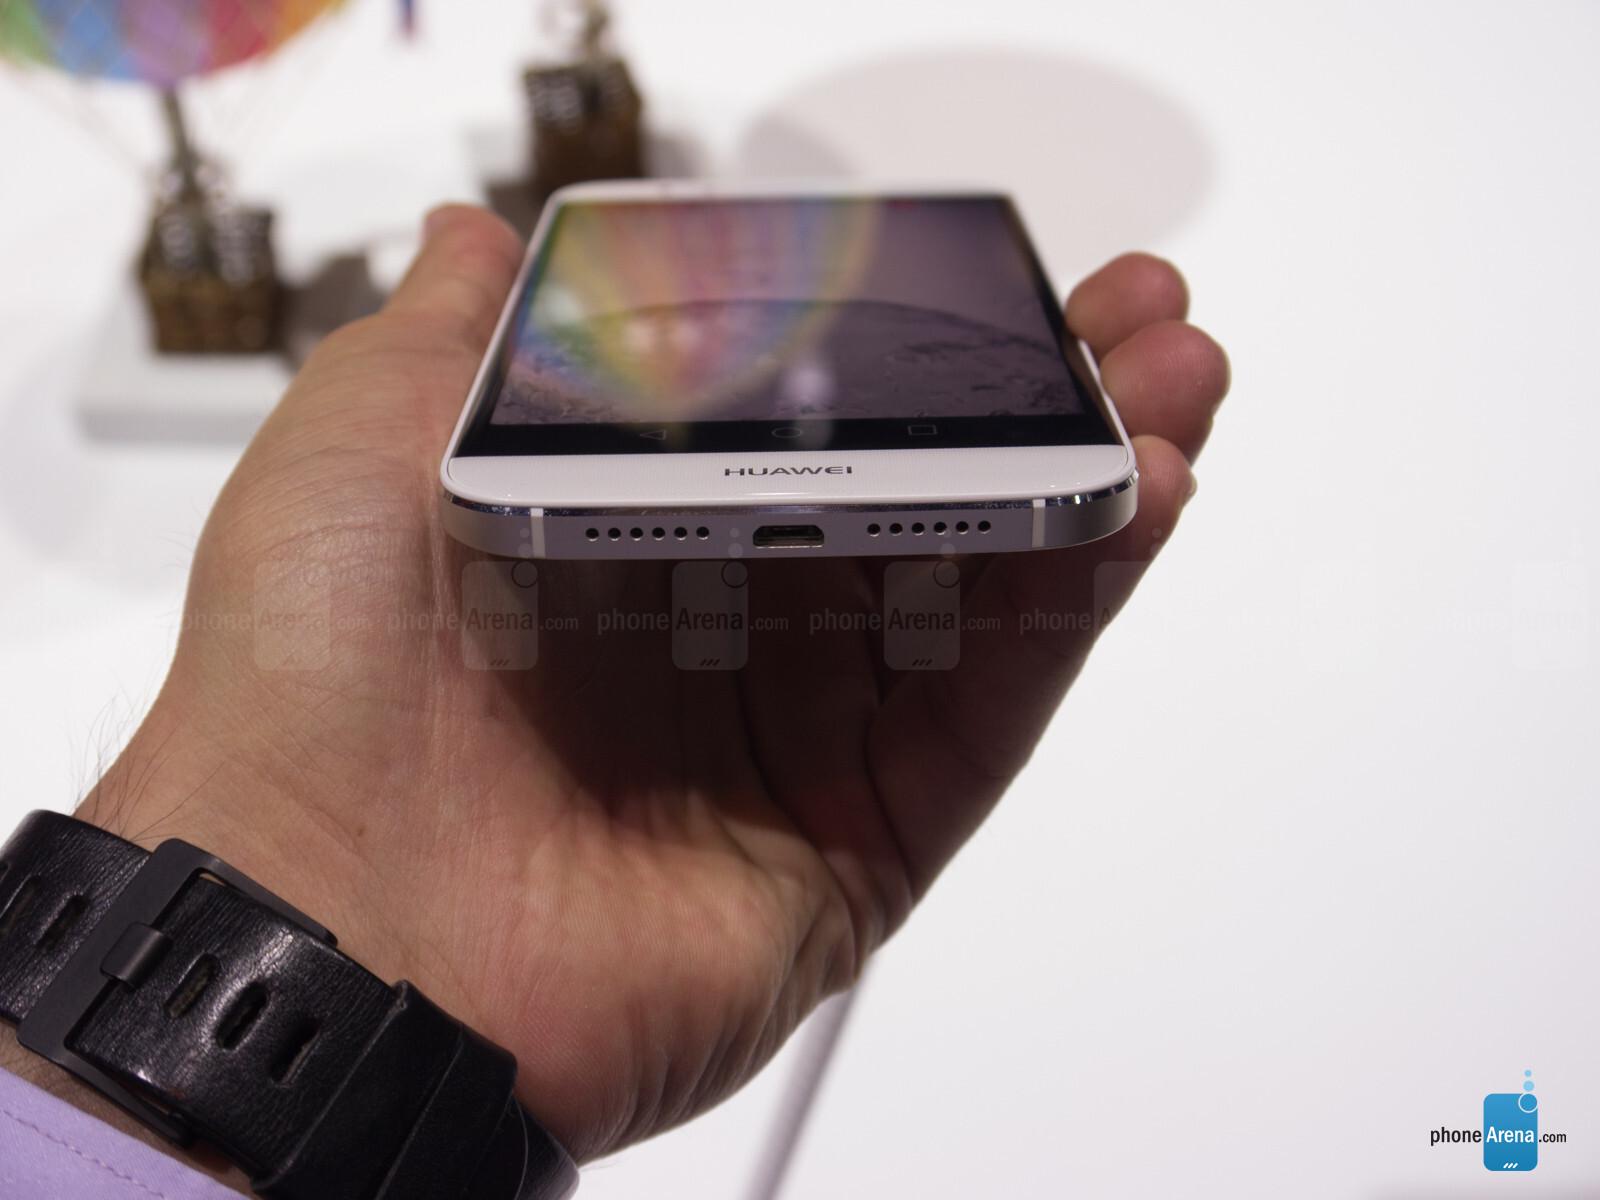 Huawei G8 Hands On Polished All Metal Looks Midrange Price